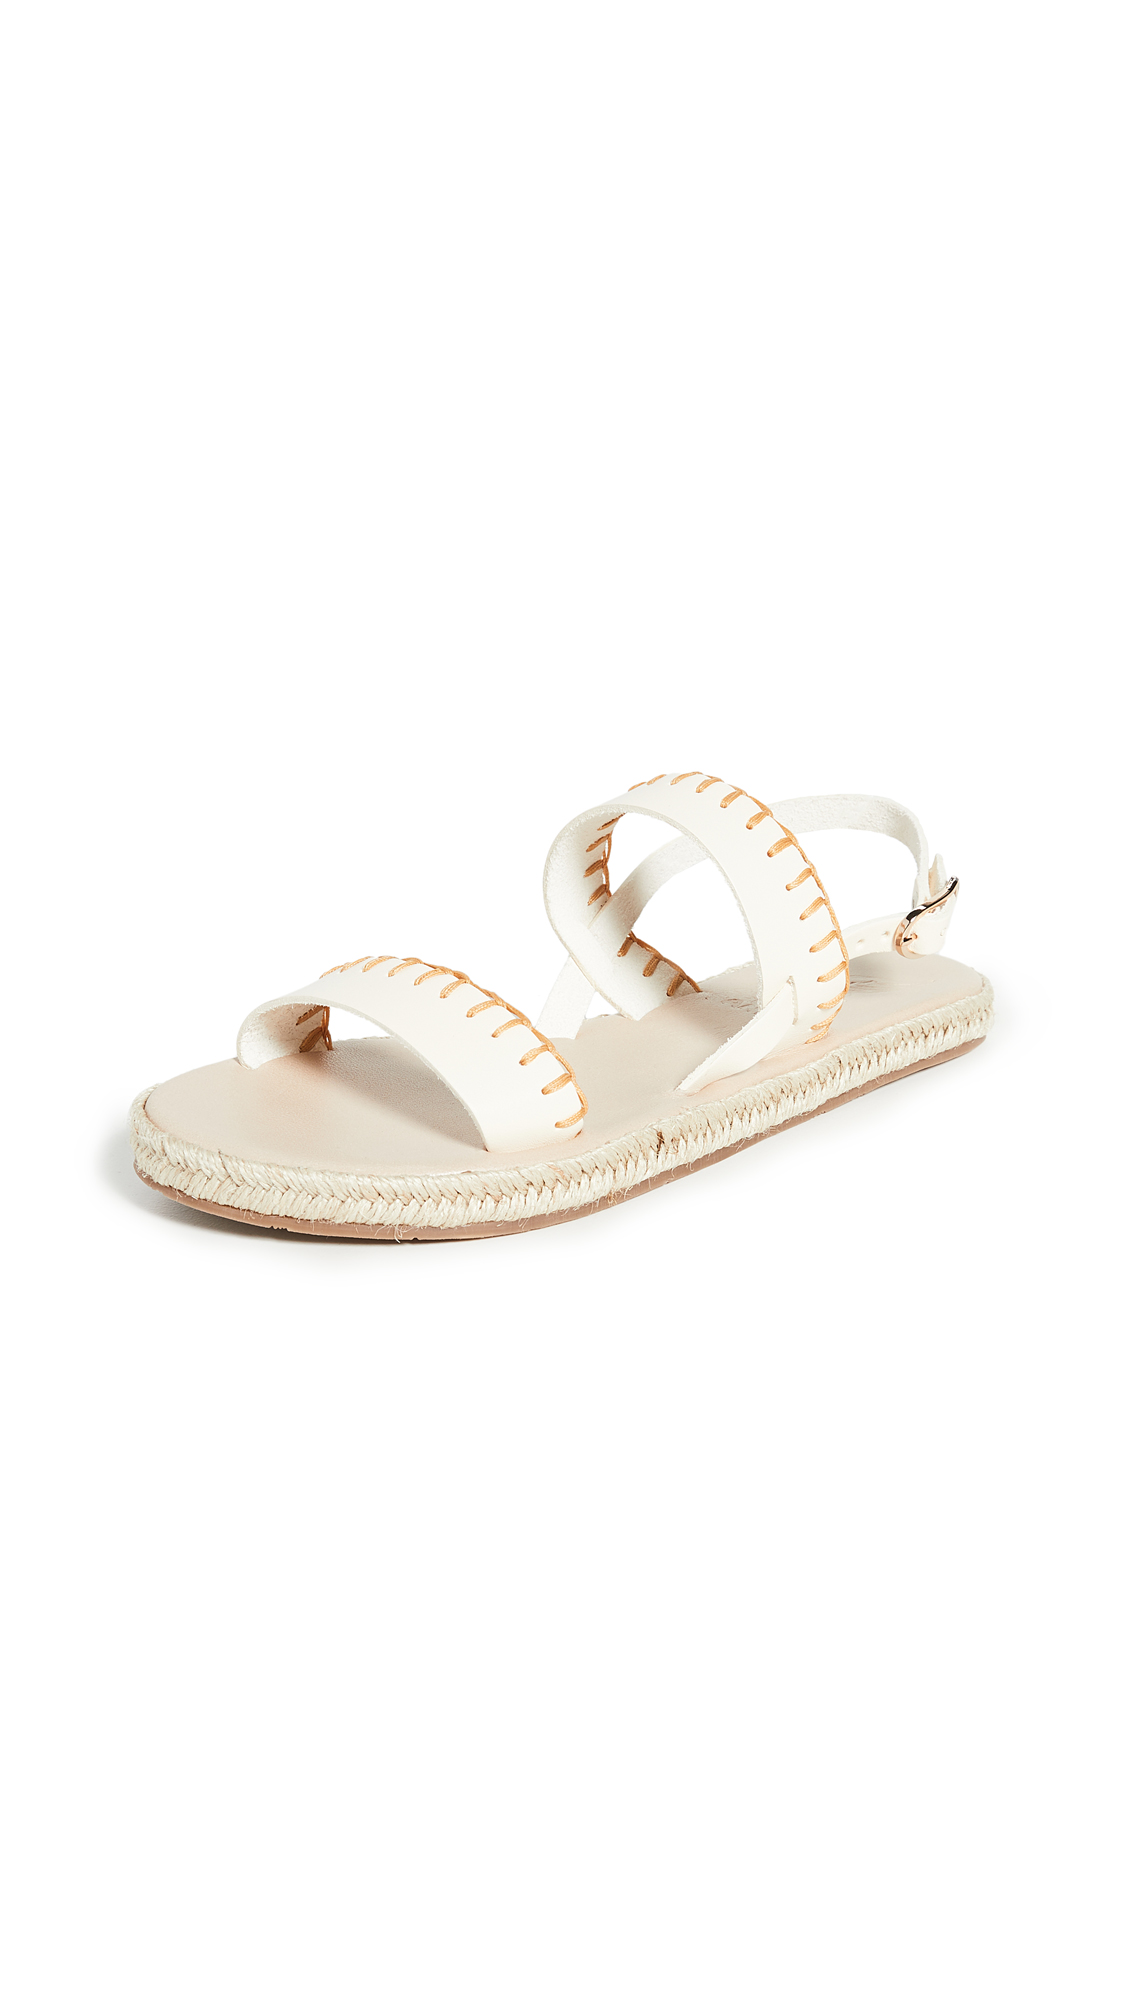 Buy Ancient Greek Sandals Clara Sandals online, shop Ancient Greek Sandals